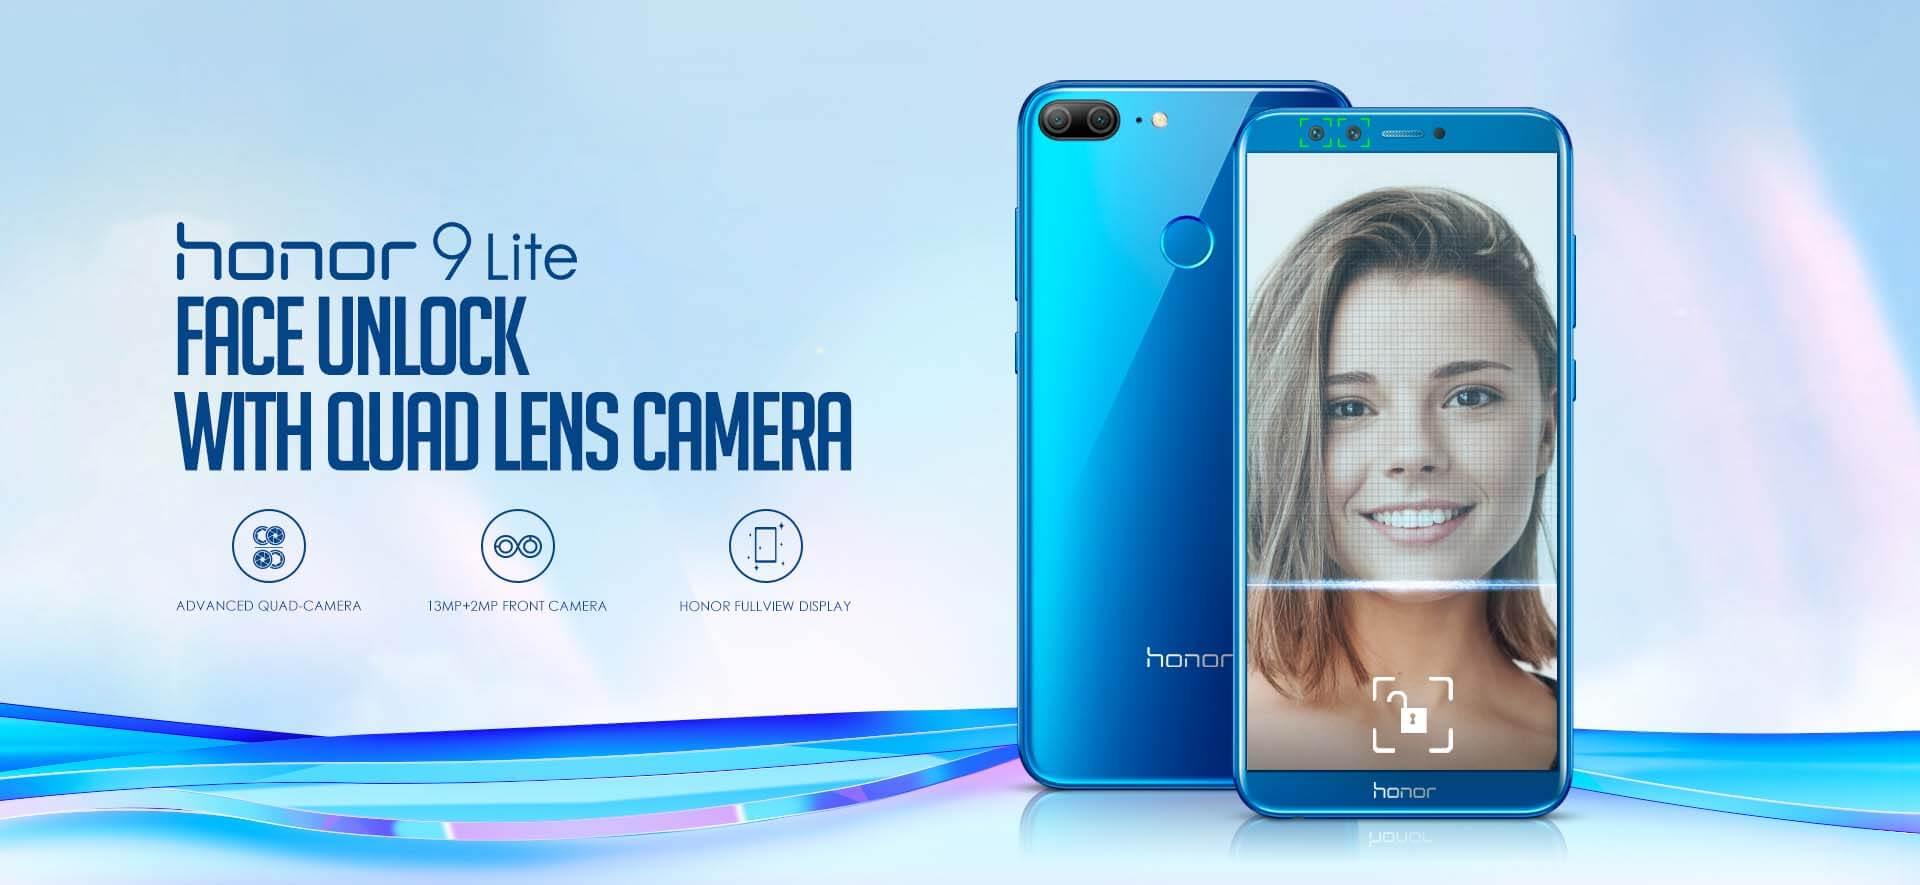 HONOR 9 Lite Price/Review: Buy Quad Lens Camera Phone